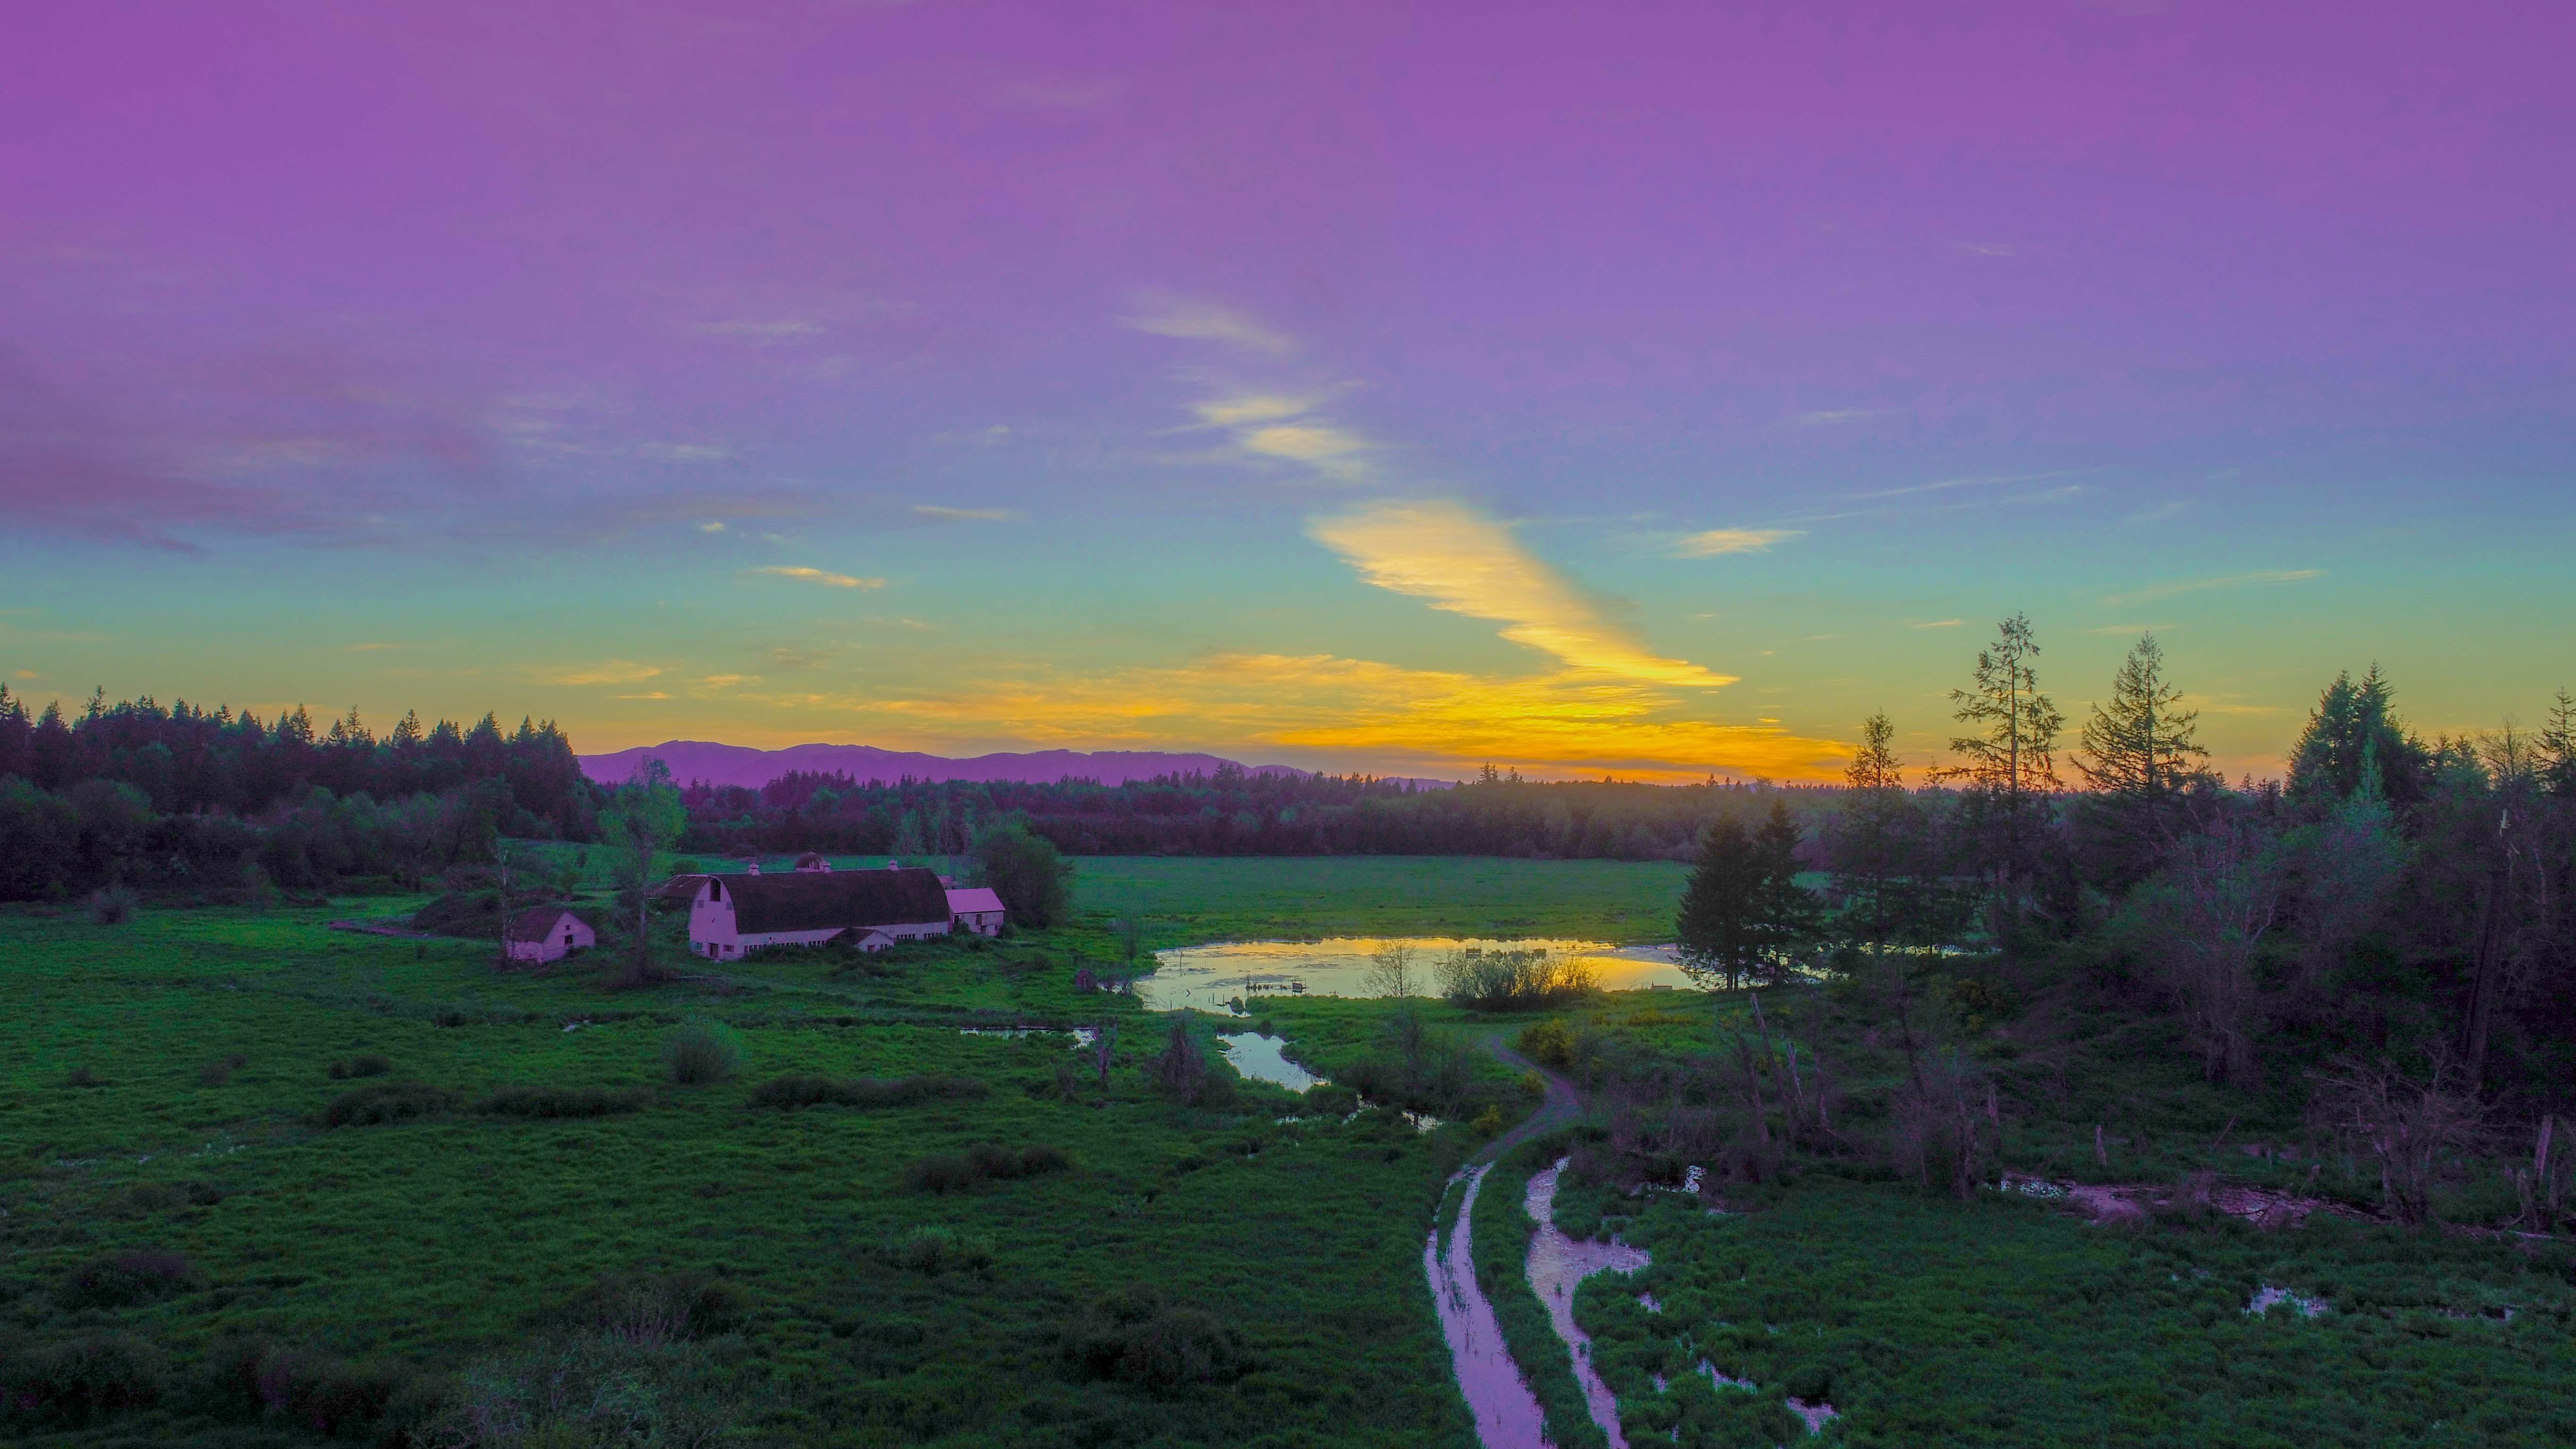 Sunset over East Oly farm